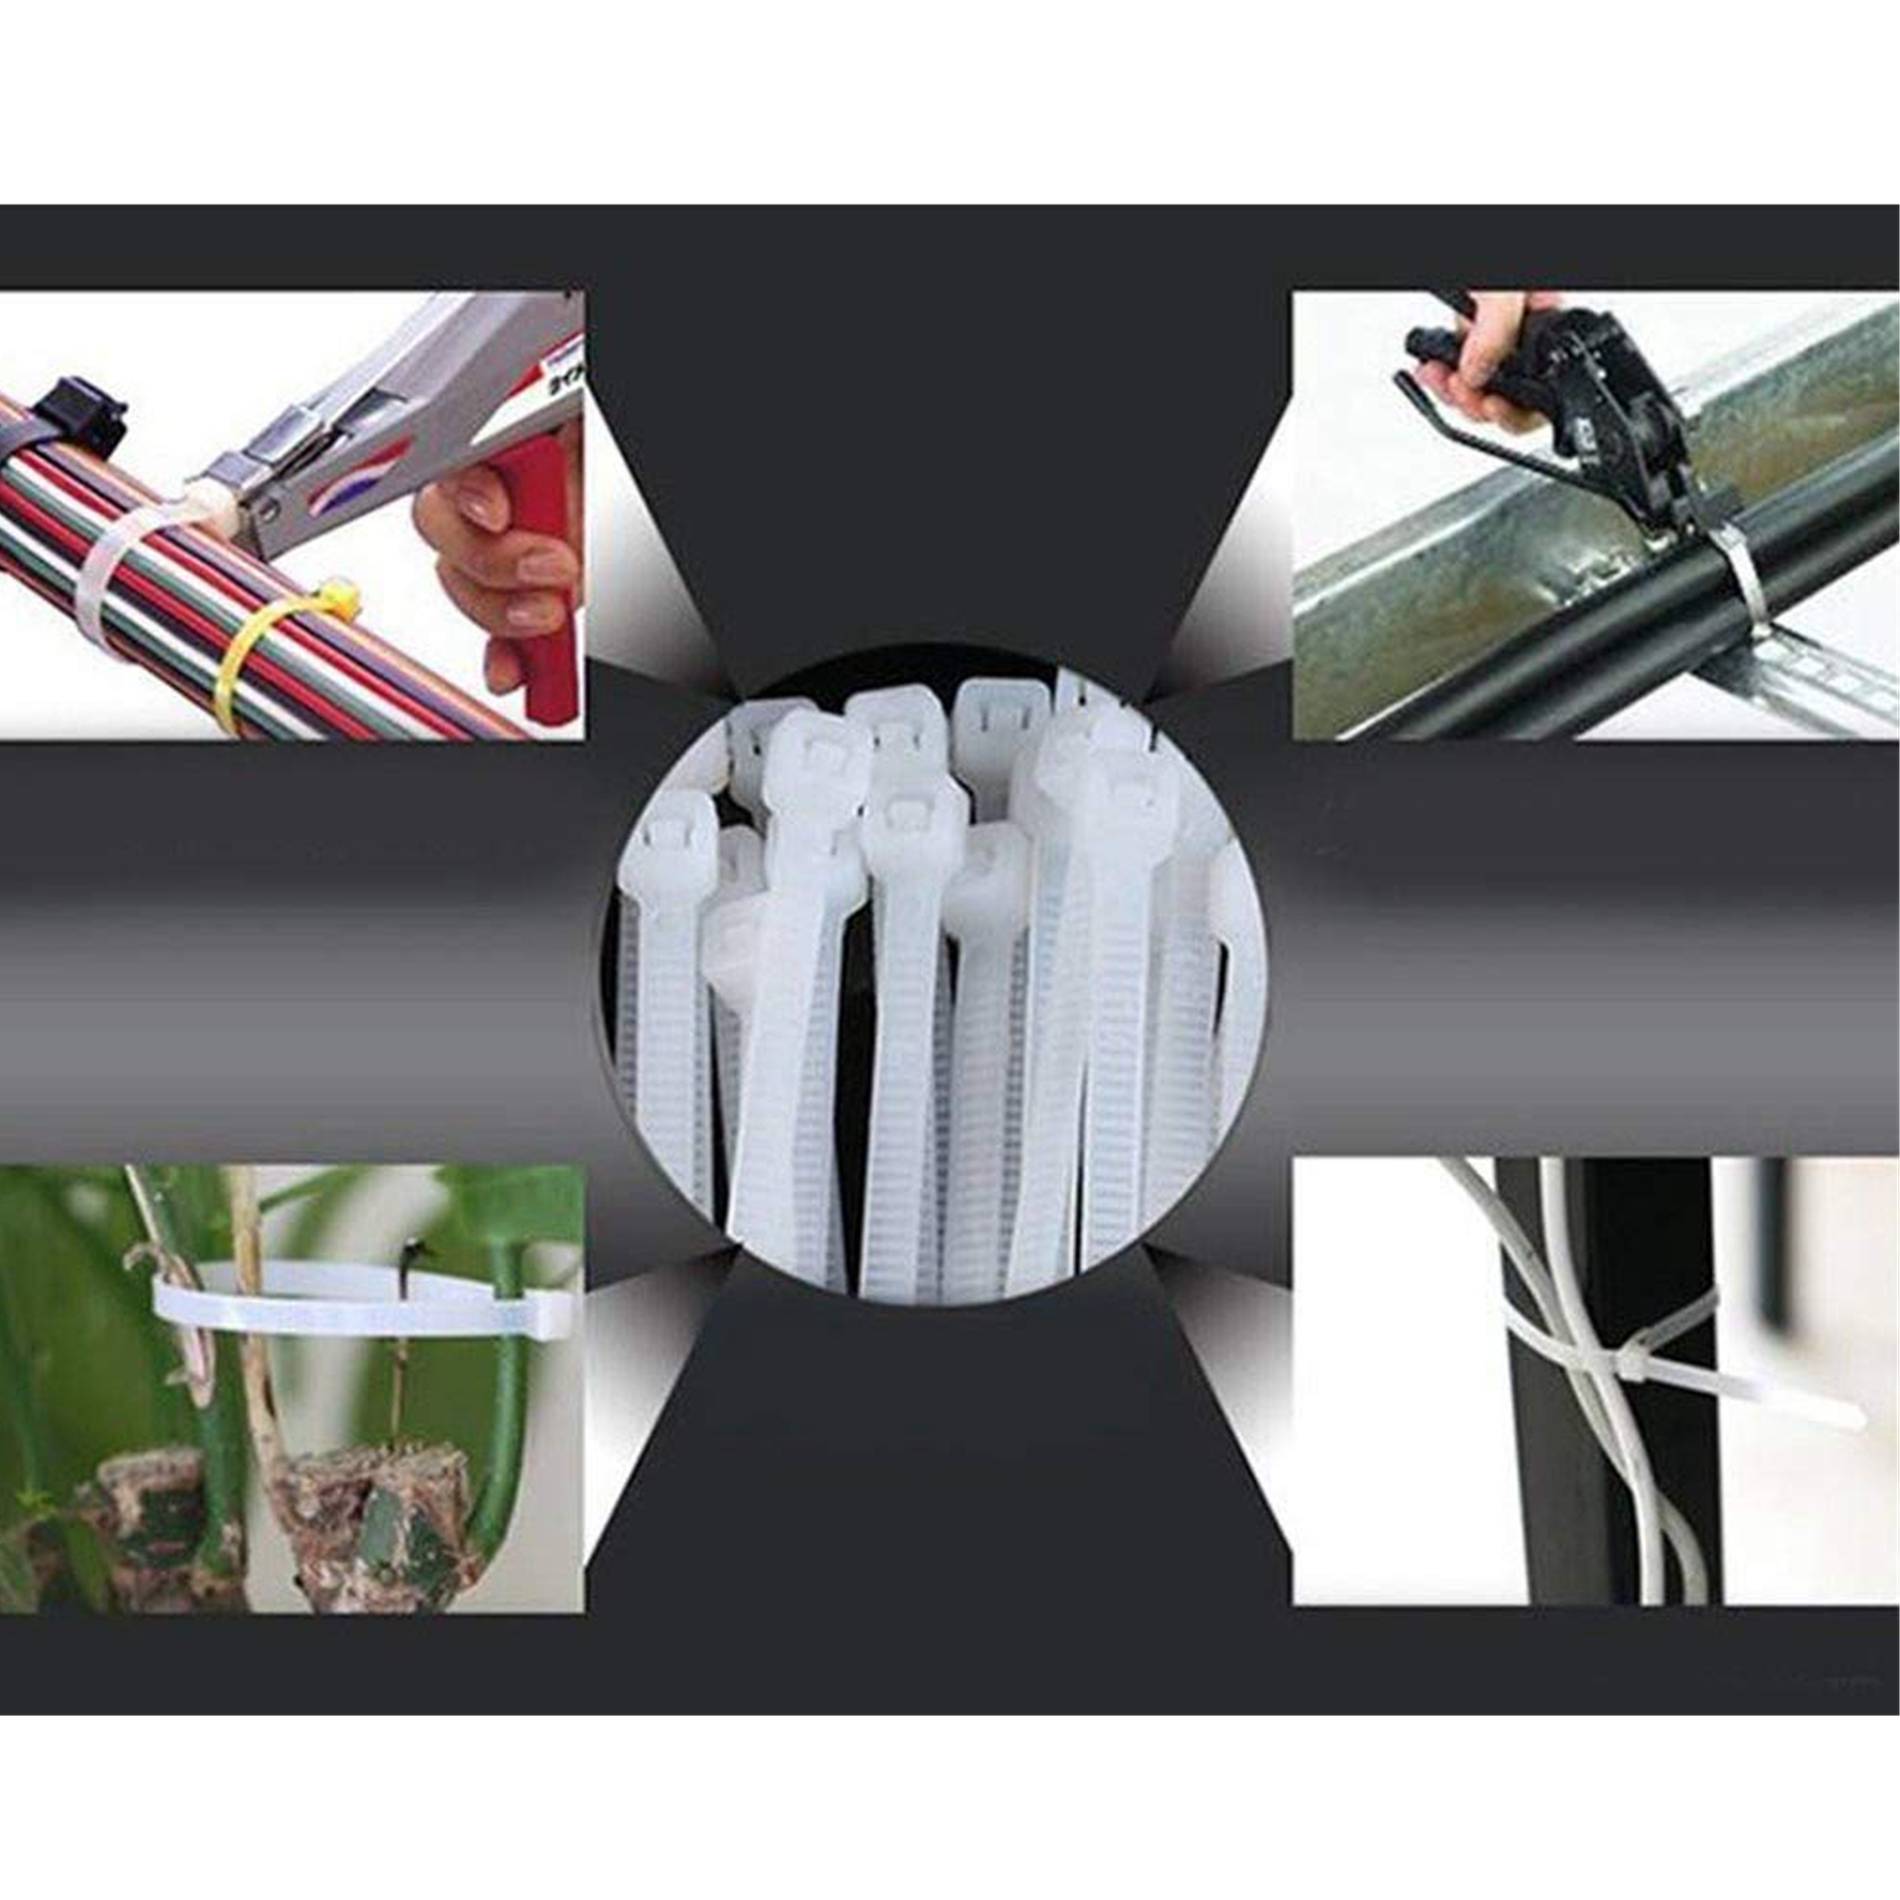 Hampool Good Quality White 2.3*60MM Customized Durable Self-locking Nylon Cable Tie